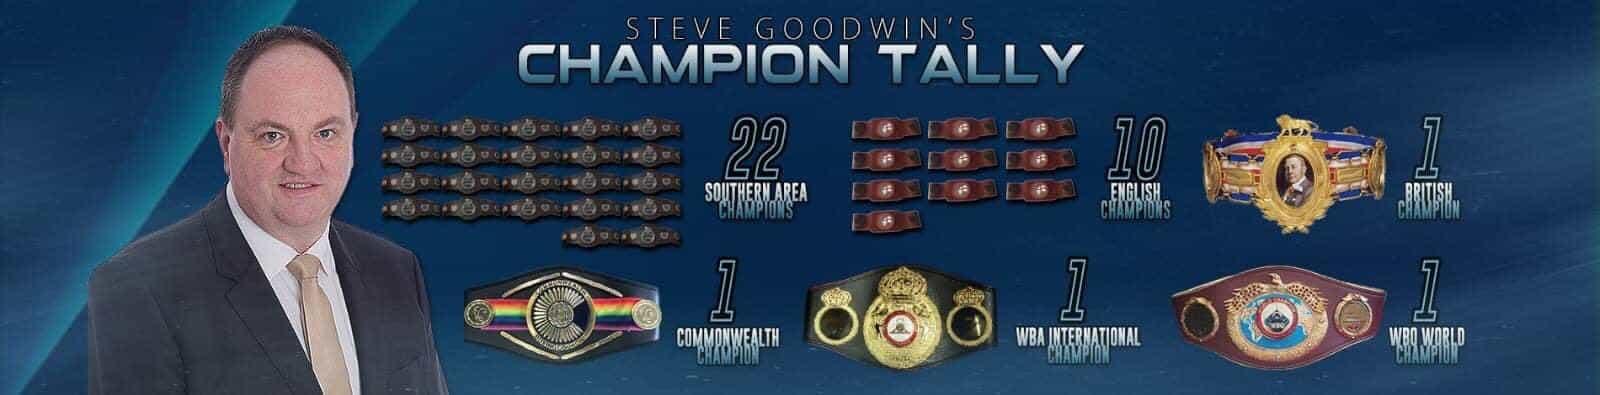 Steve Goodwin Champion Tally